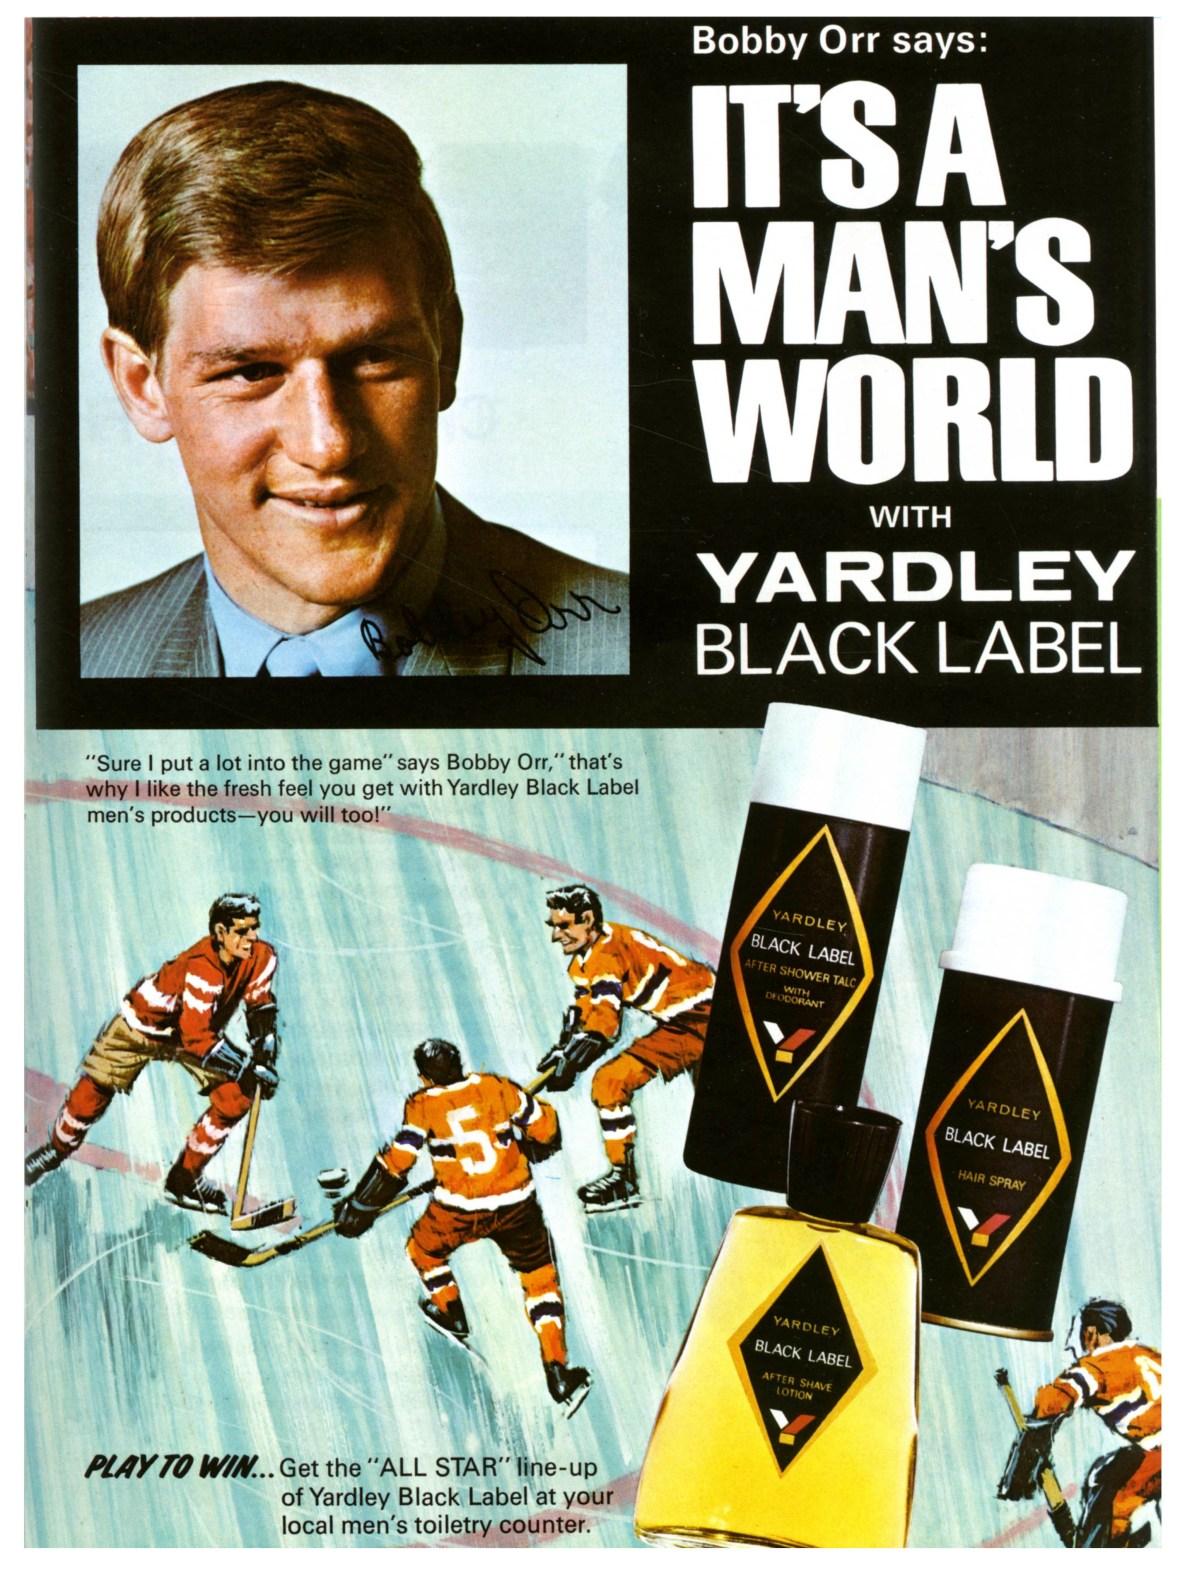 Yardley Black Label featuring Bobby Orr - 1970